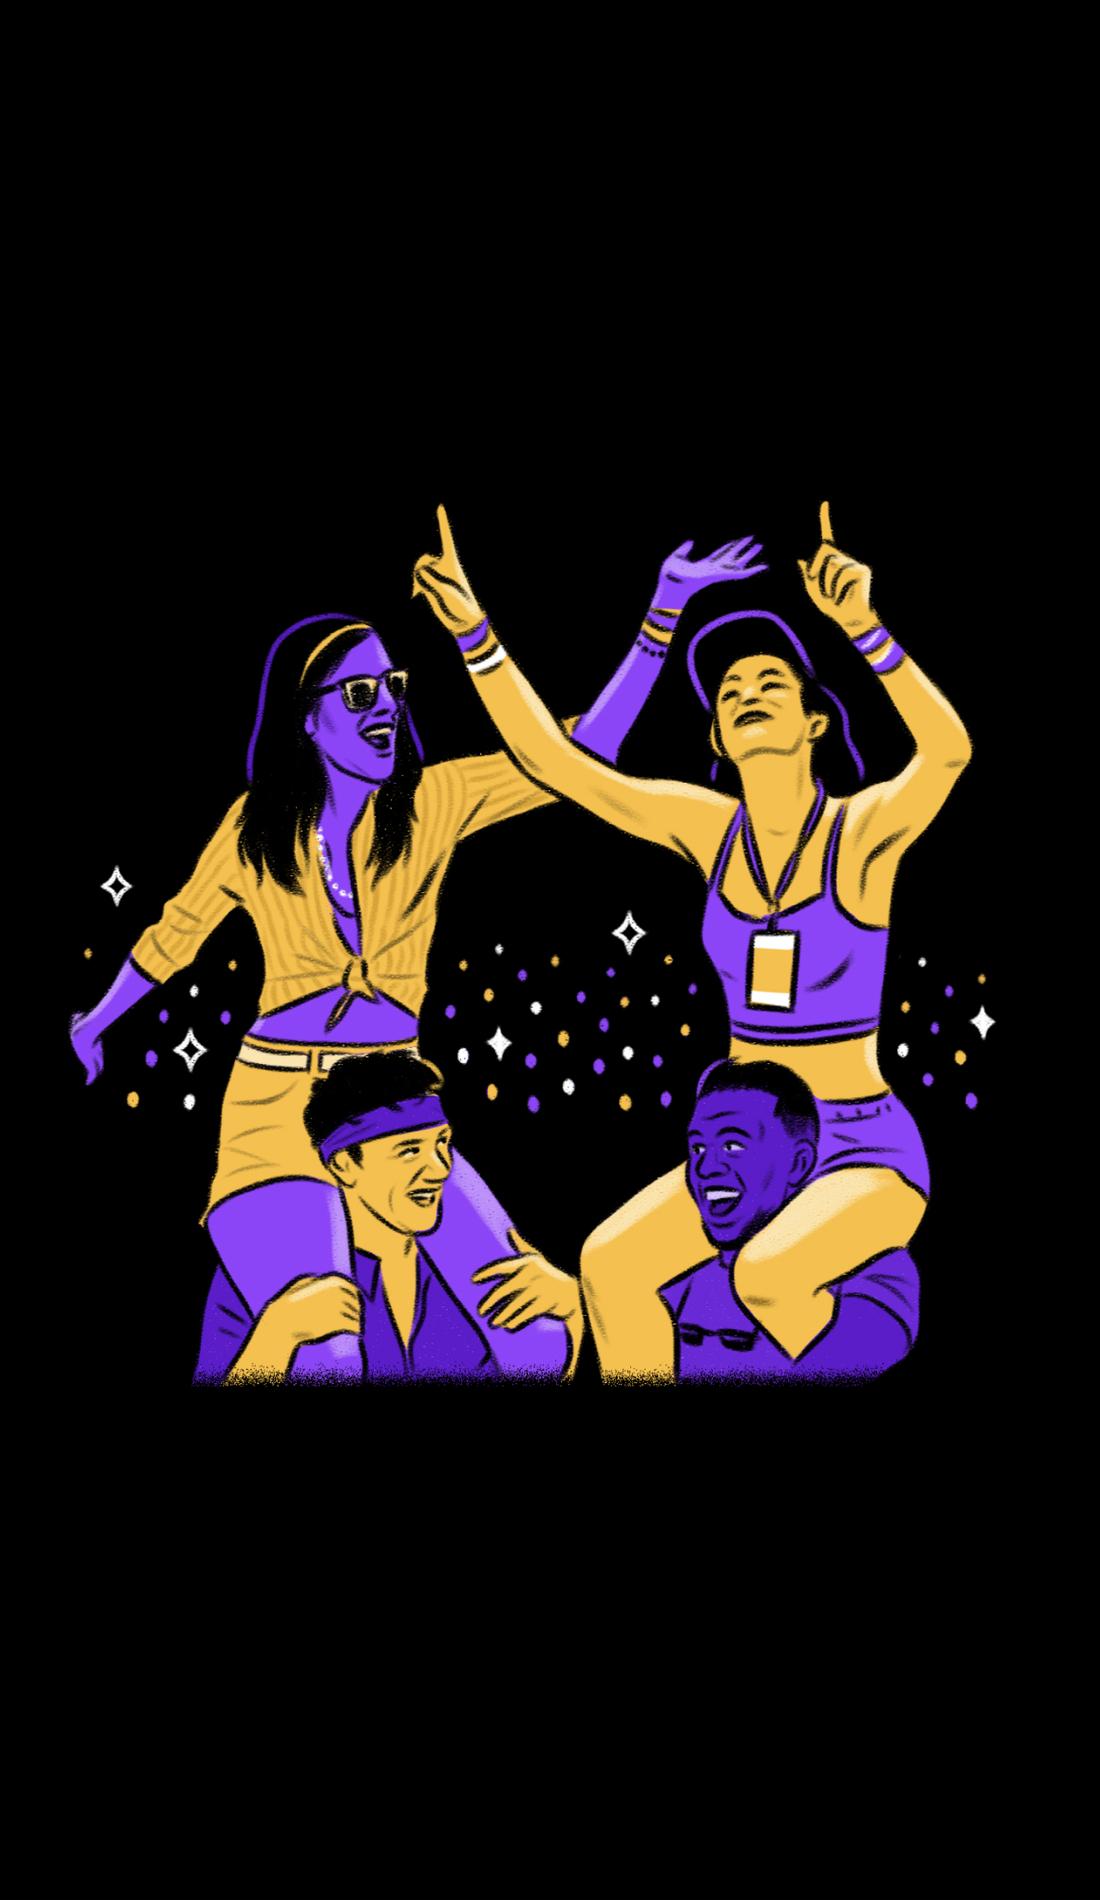 A Winstock Country Music Festival live event